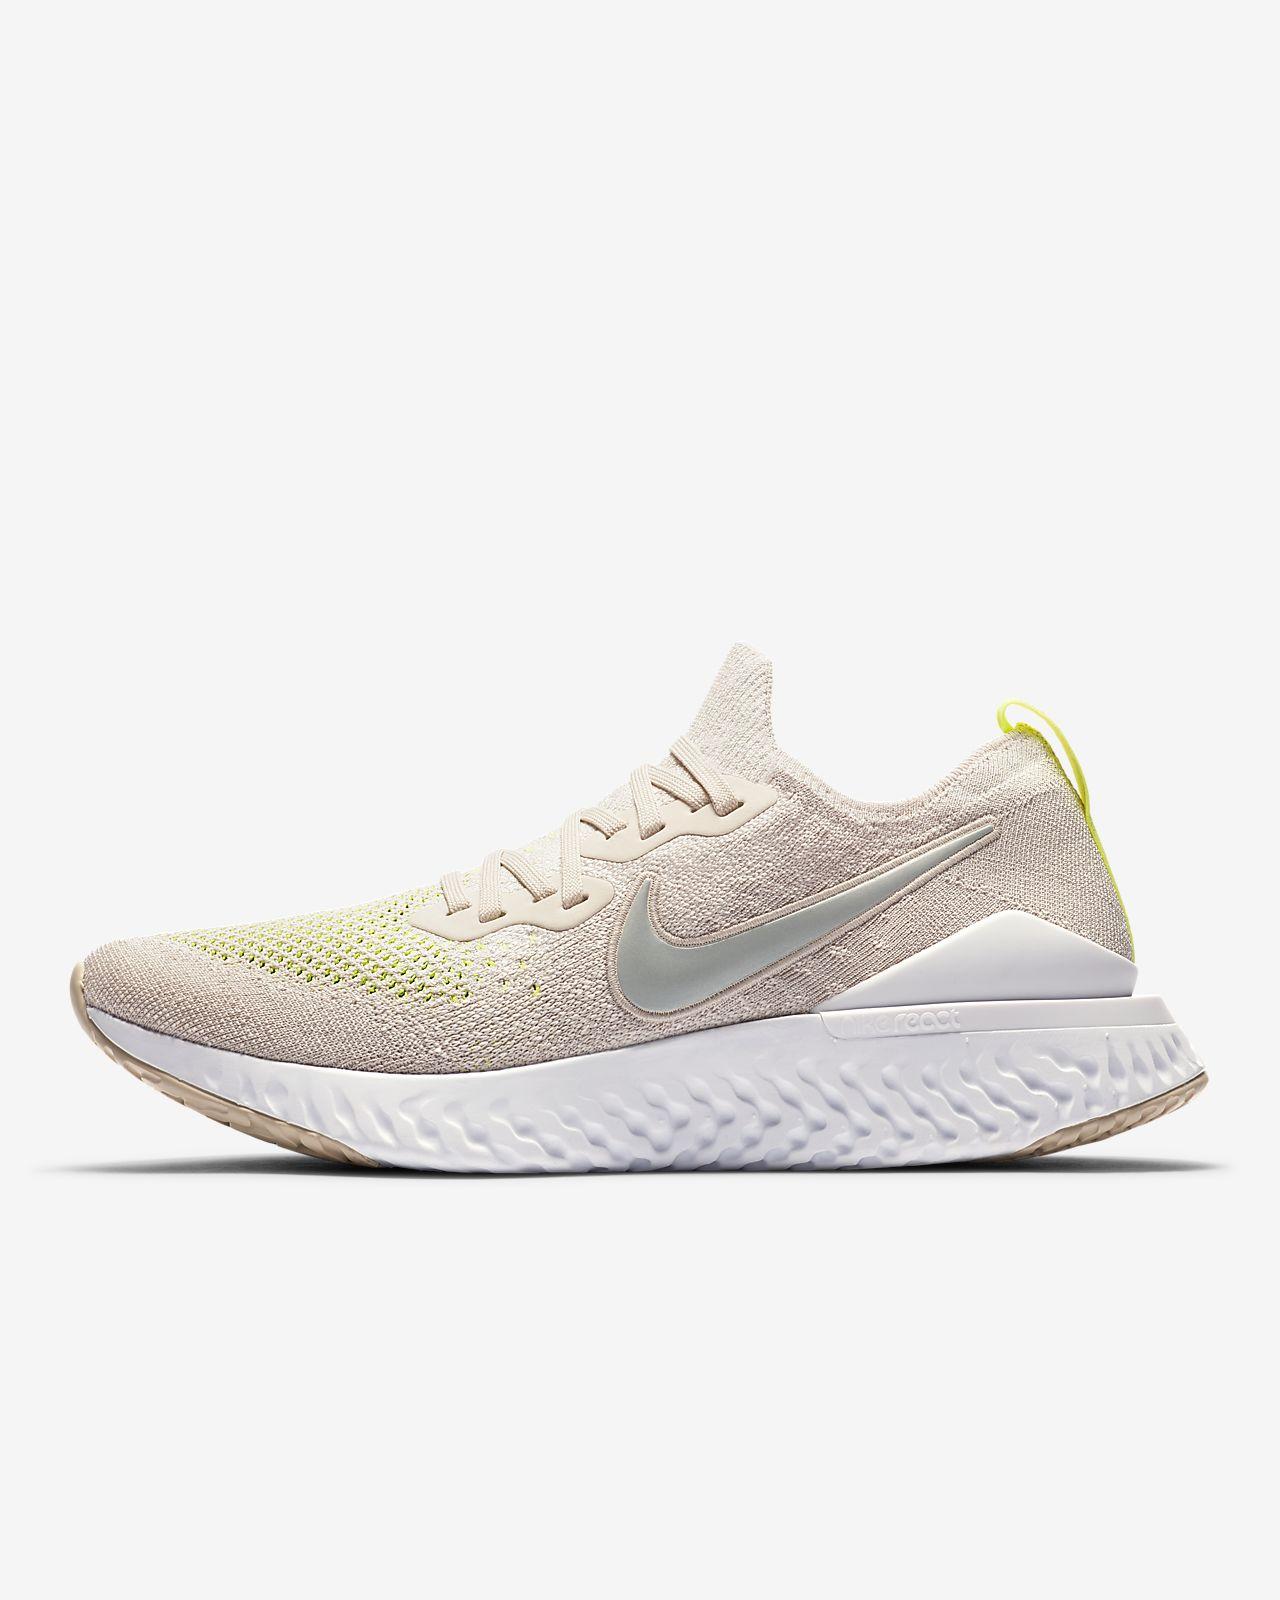 Contable Proponer Abrumador  Nike Epic React Flyknit 2 Zapatillas de running - Hombre. Nike ES